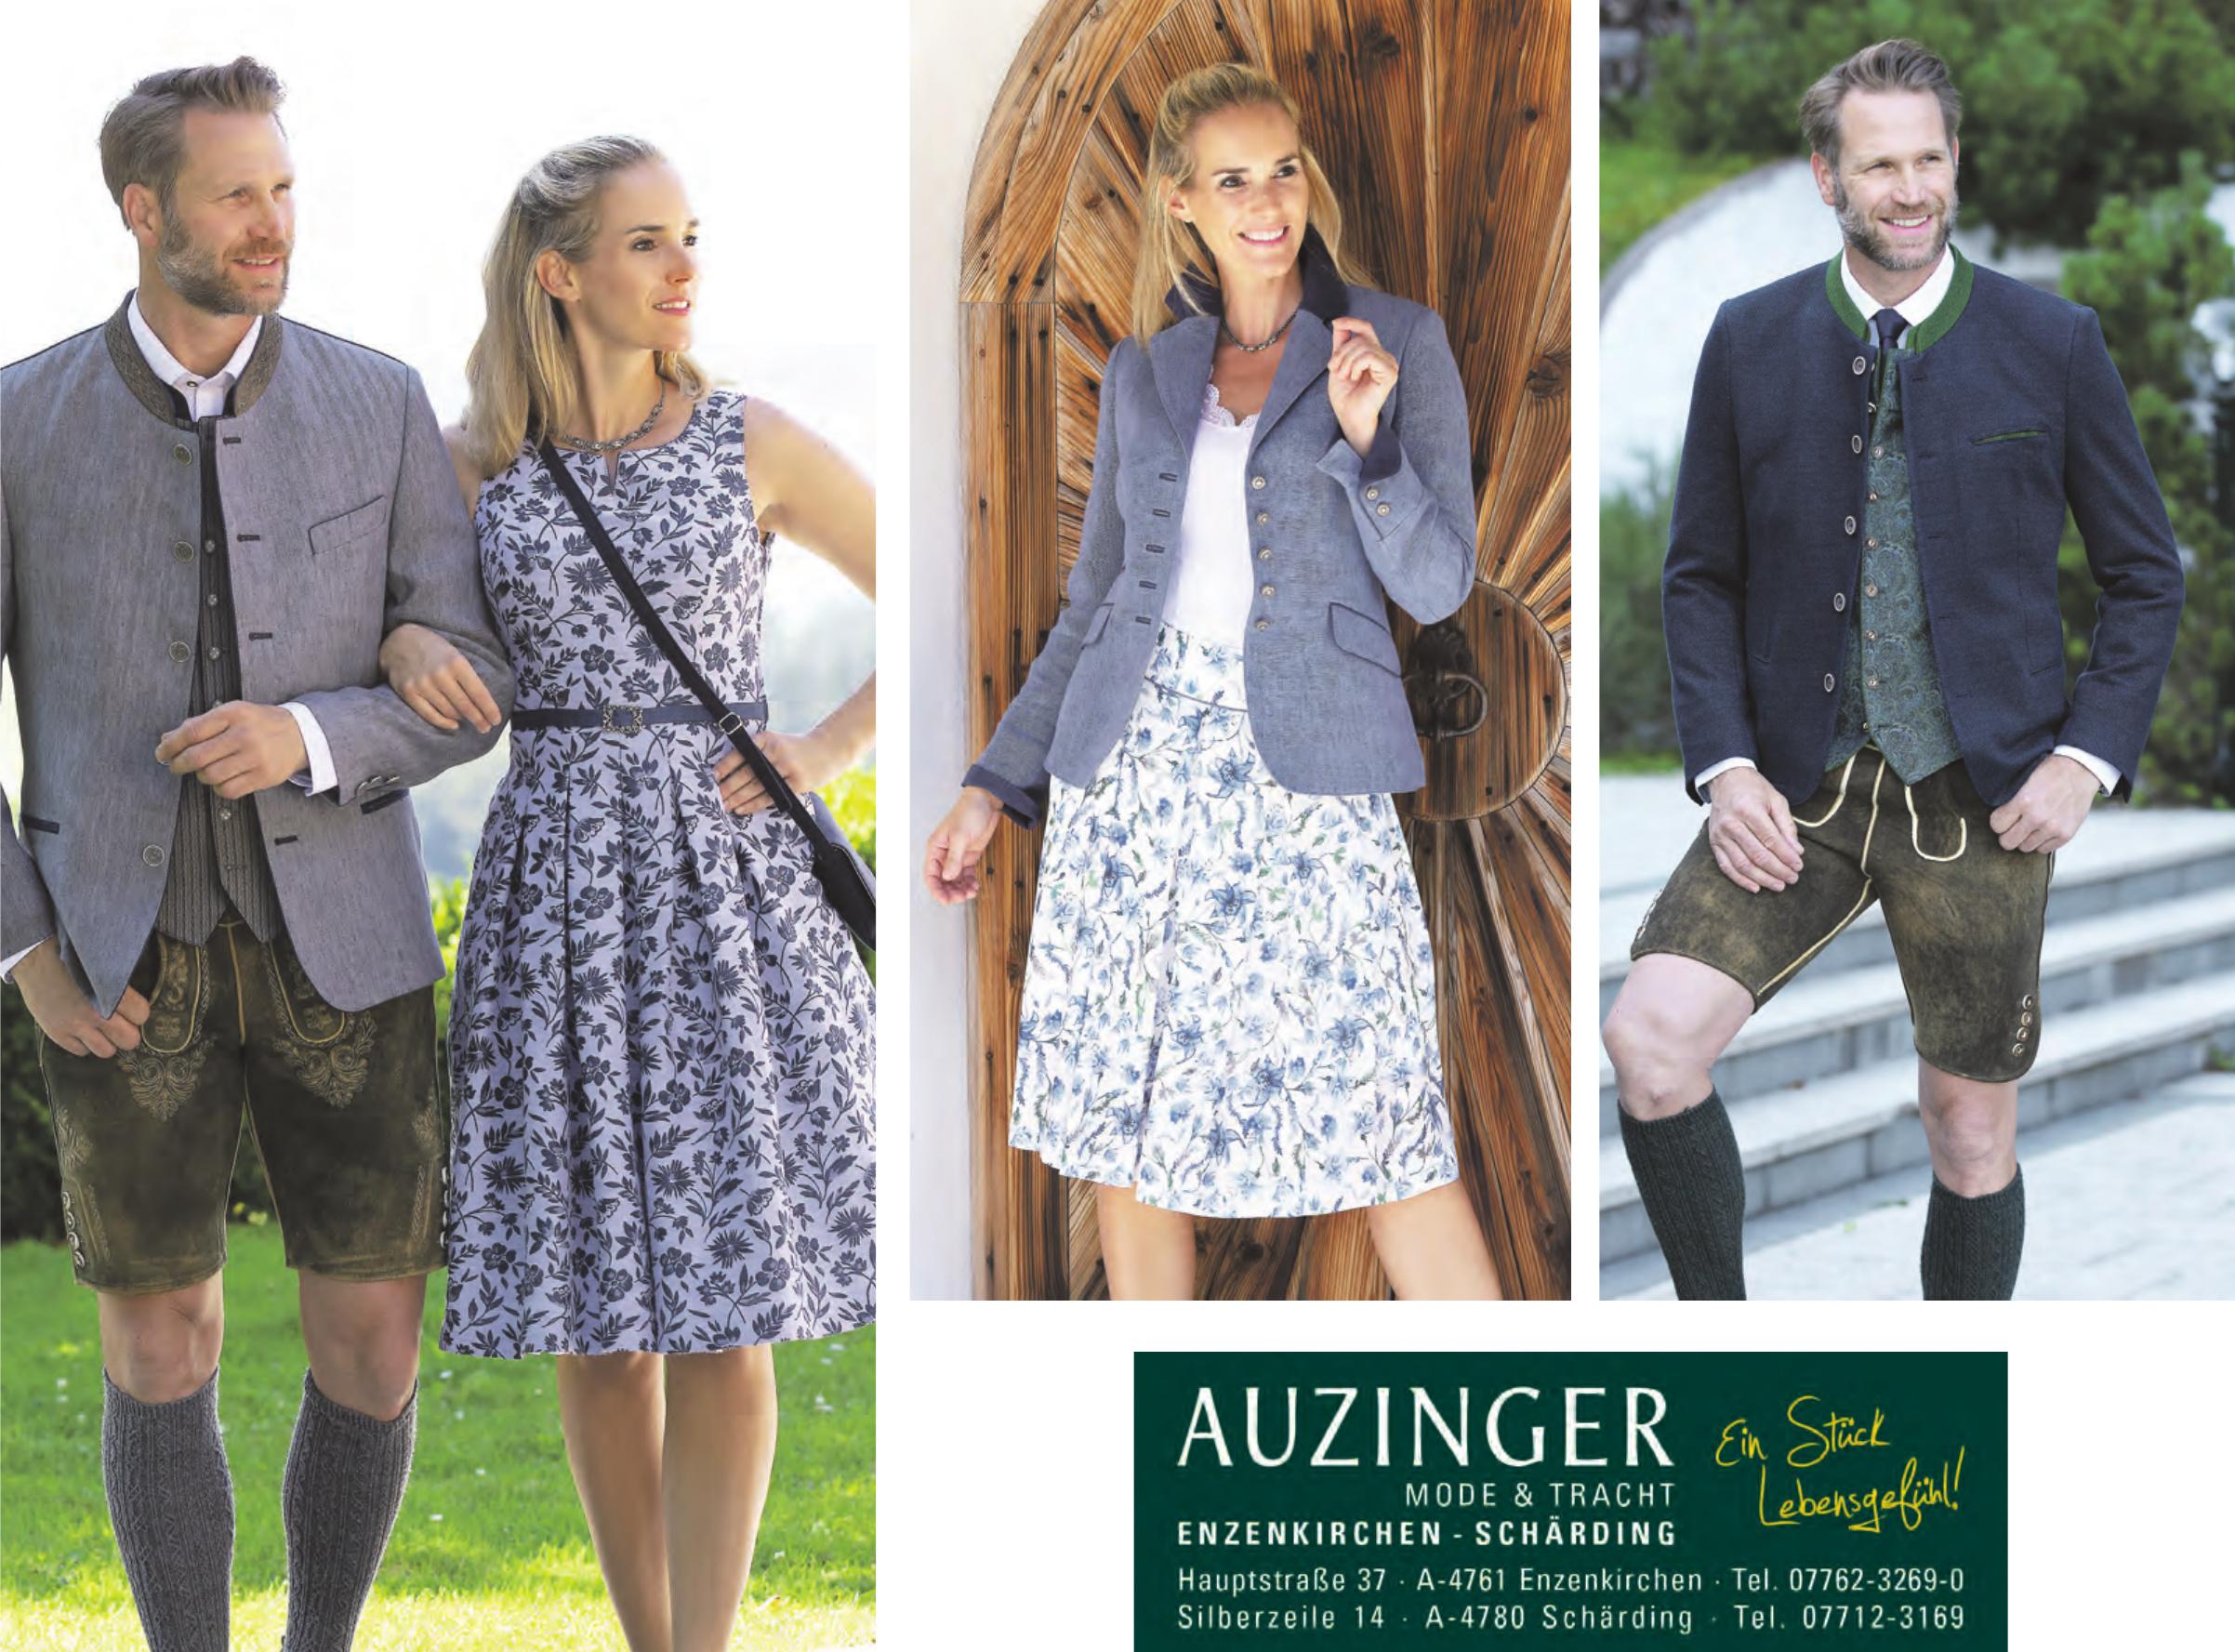 Auzinger Mode & Tracht